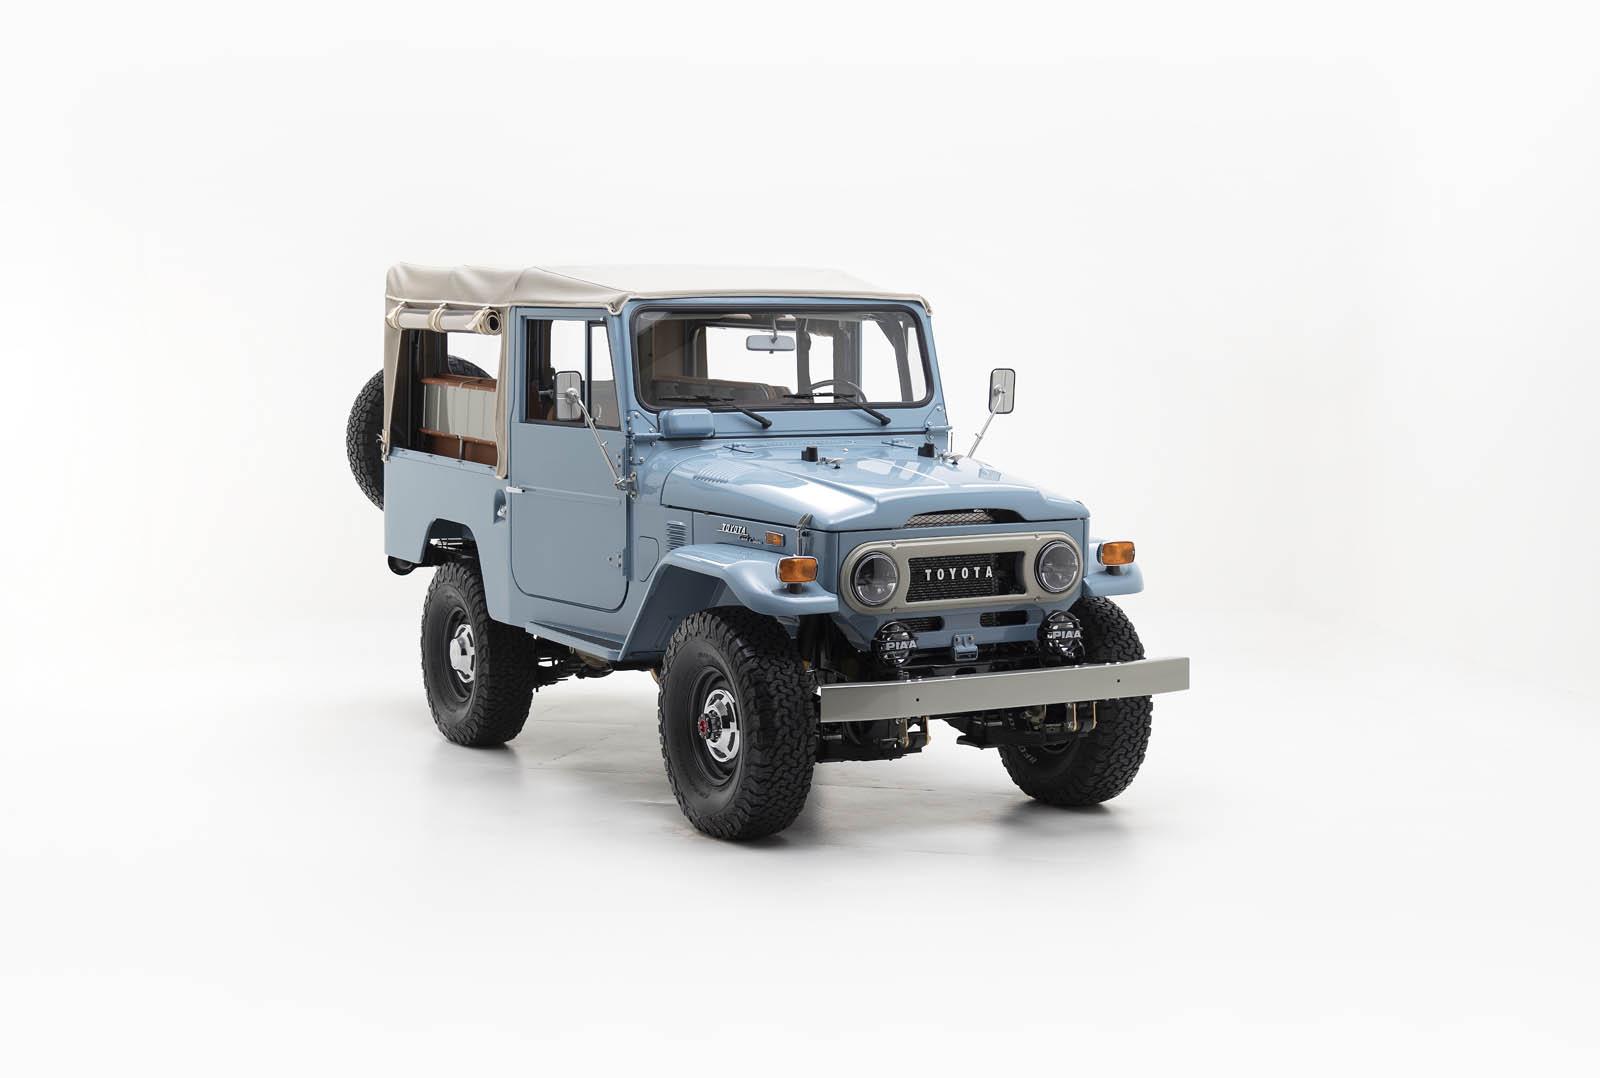 1982_Toyota_Land_Cruiser_FJ43_Aspen_Lifestyle_The_FJ_Company_09